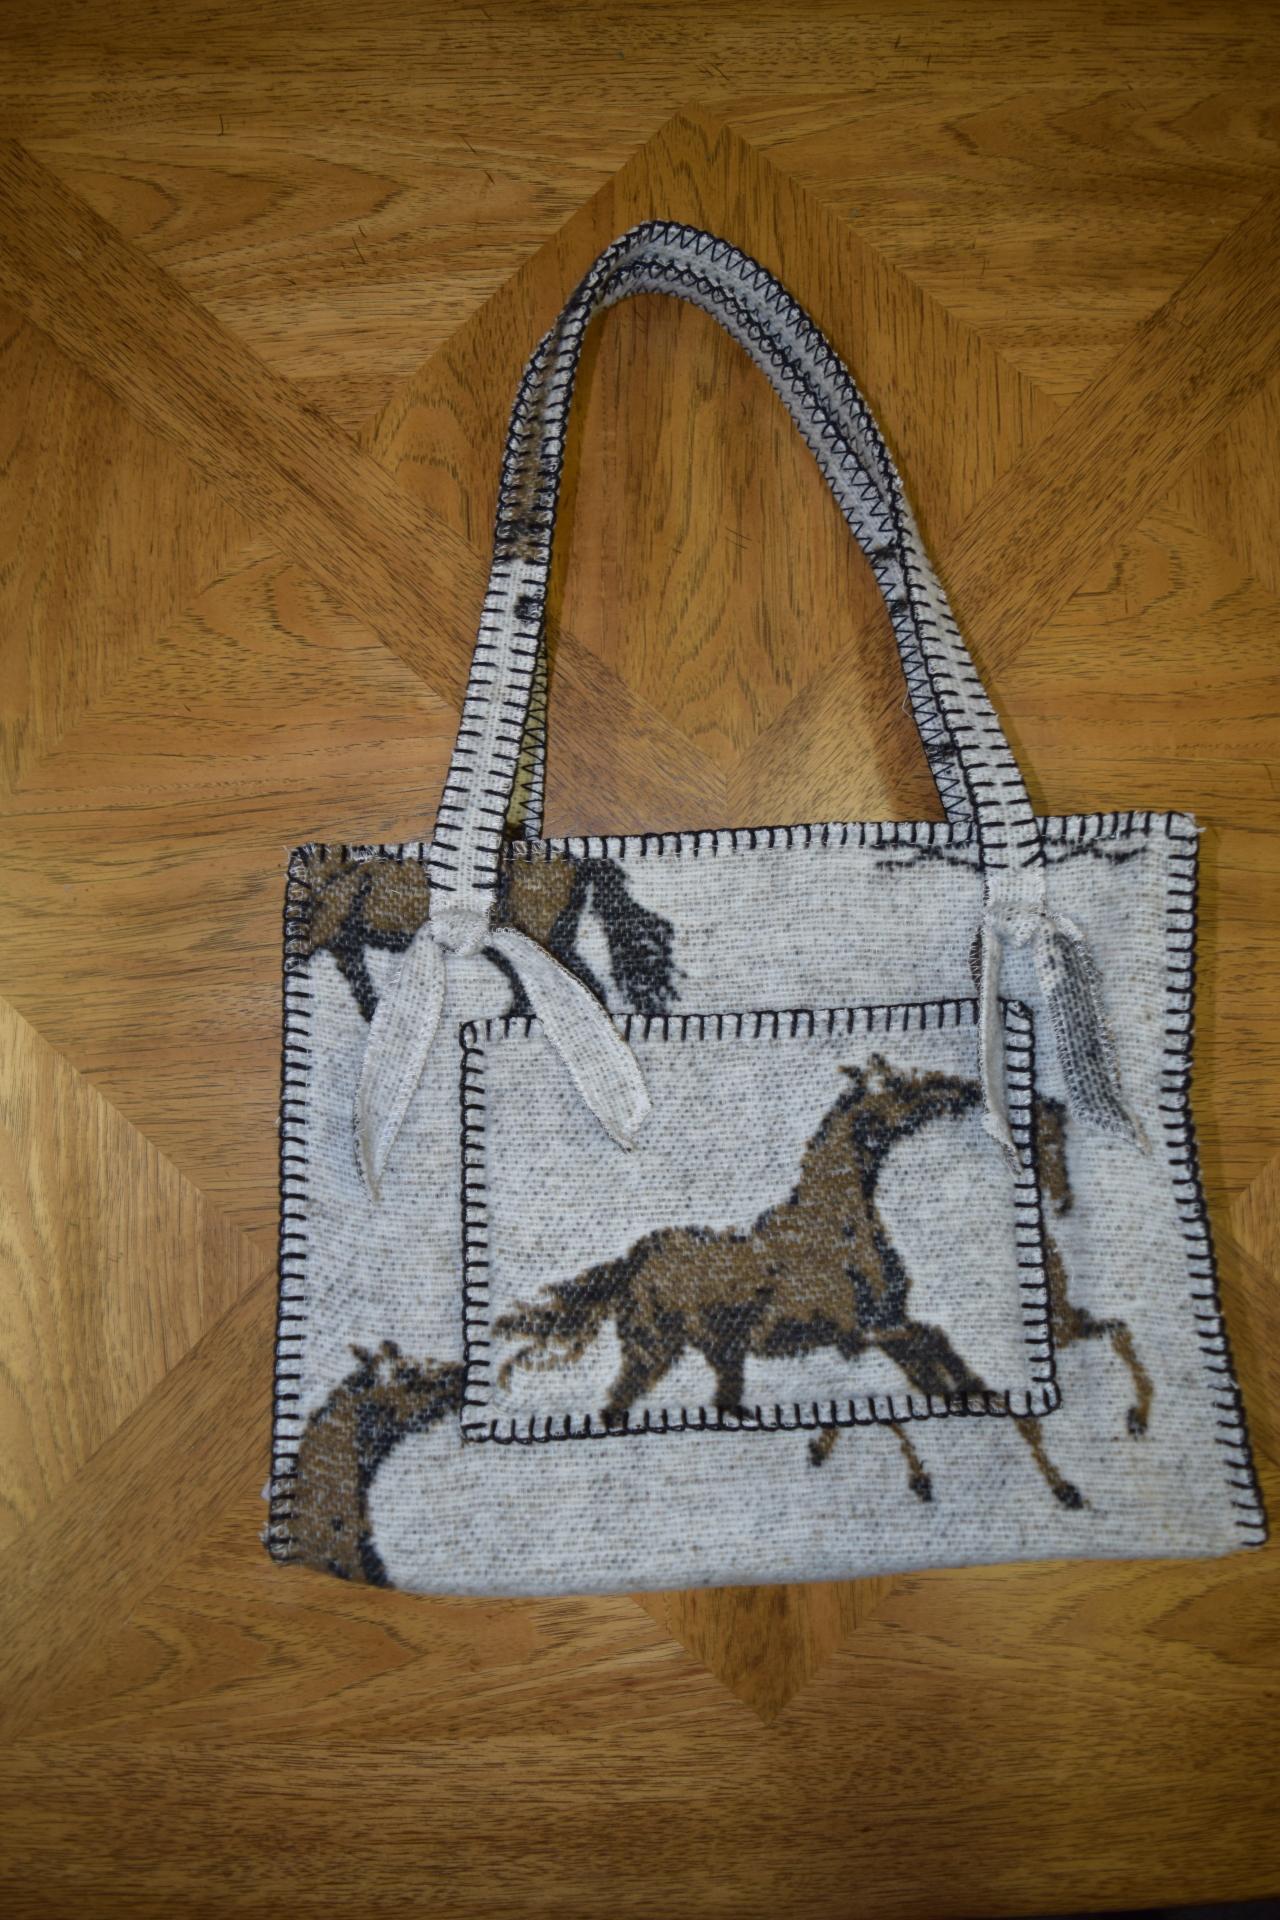 #B10HBO - OATMEAL HORSE BRANDS POCKET ZIP BAG - $99.95